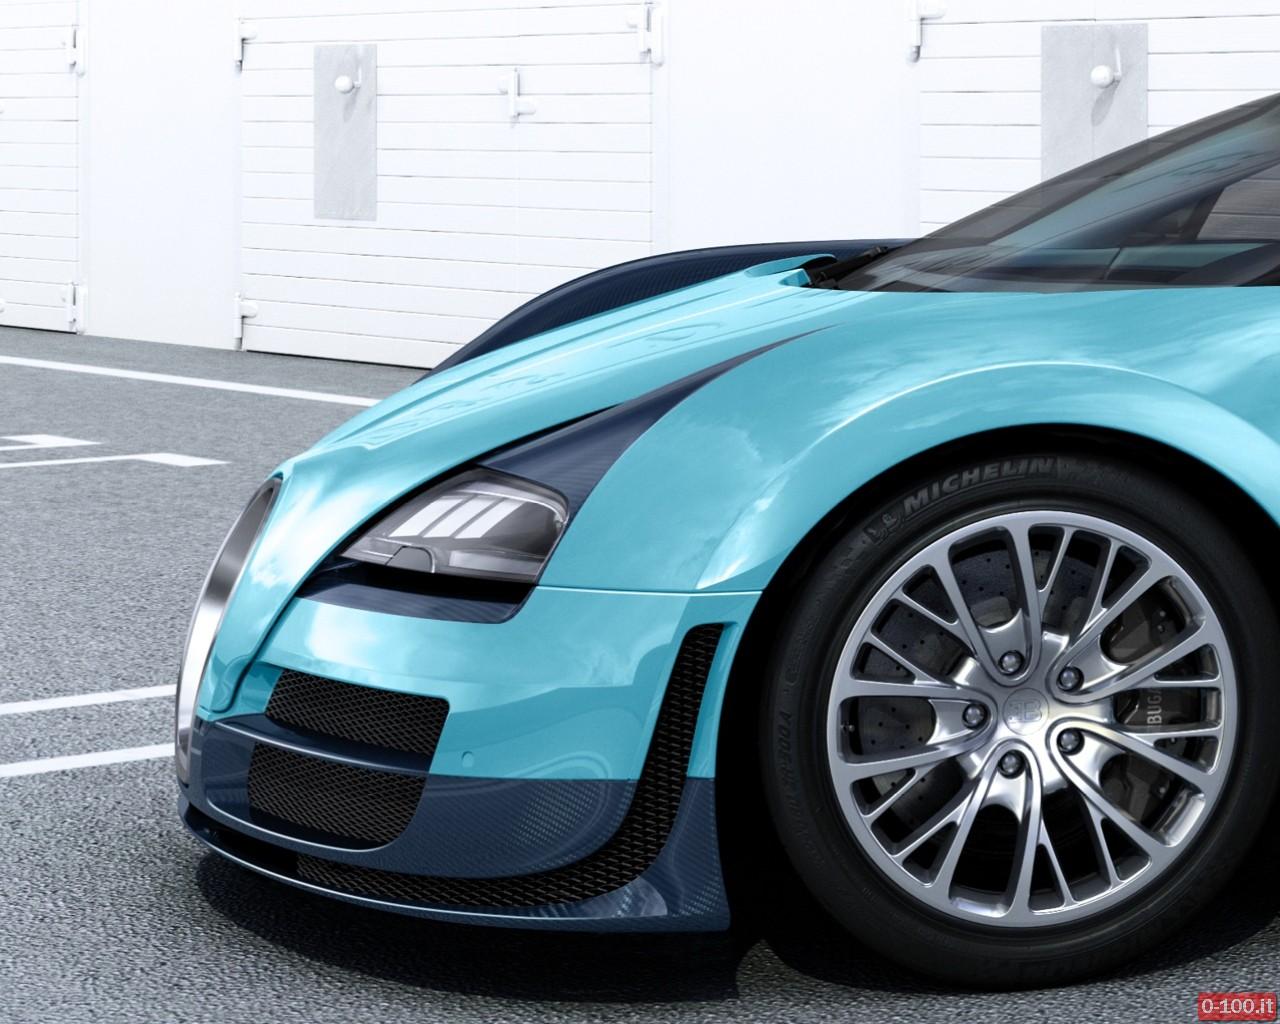 bugatti-veyron-legend-jean-pierre-wimille-0-100_4